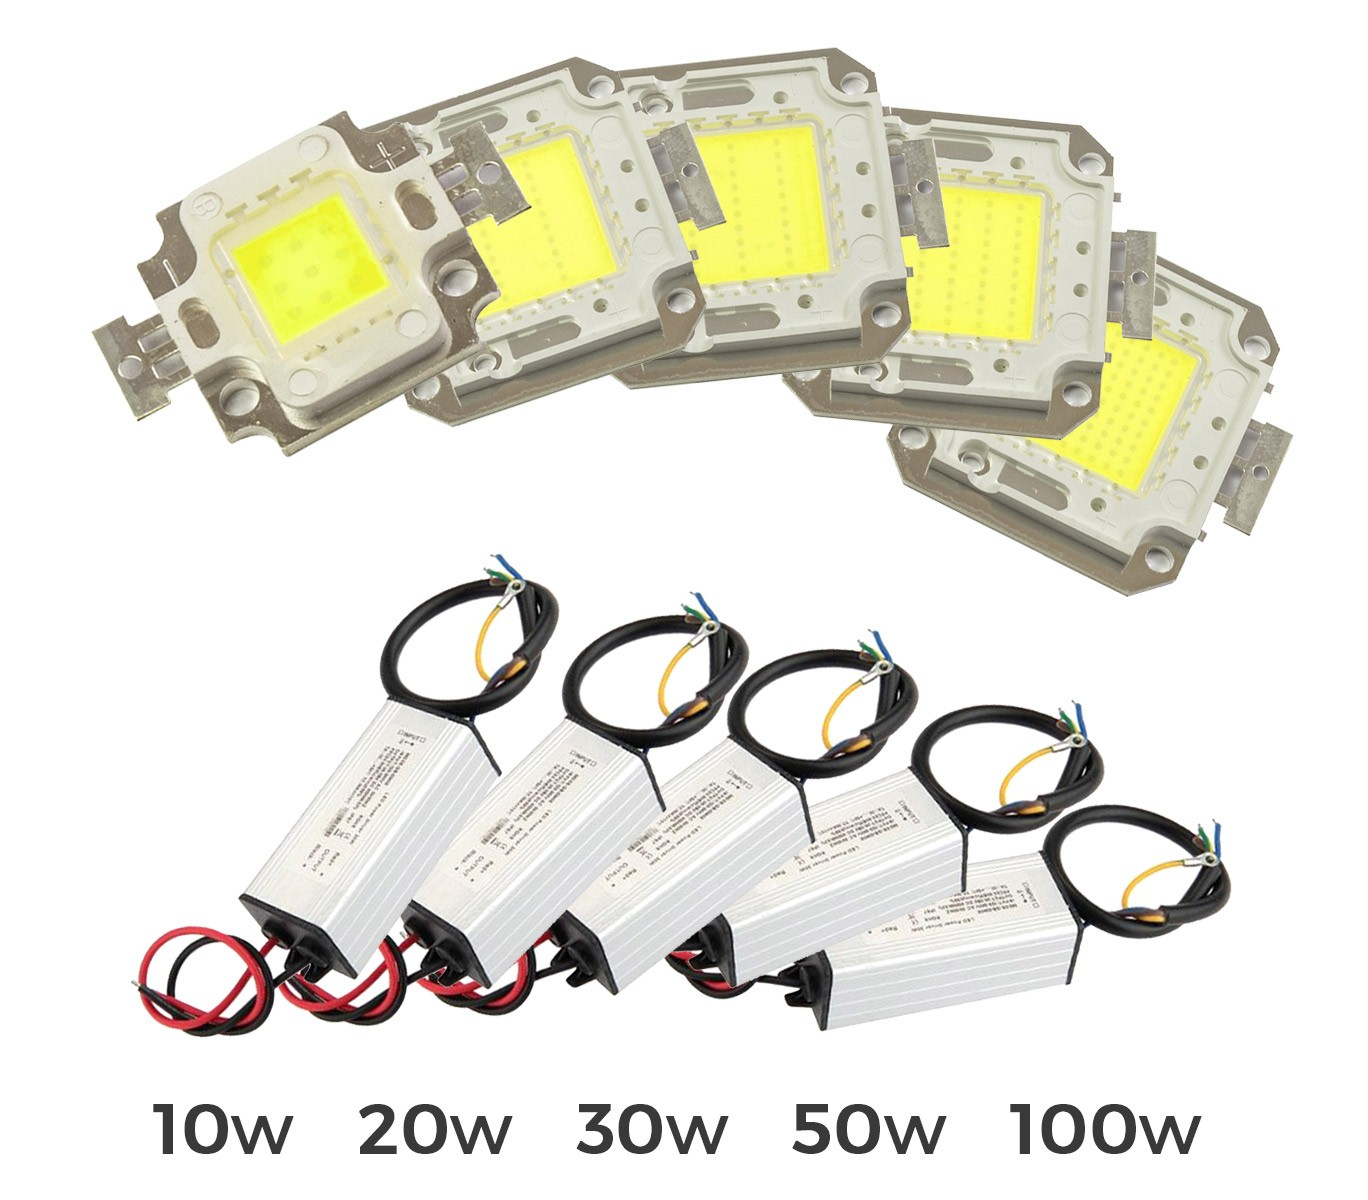 kit ricambio piastra led + led driver alimentatore per fari led a